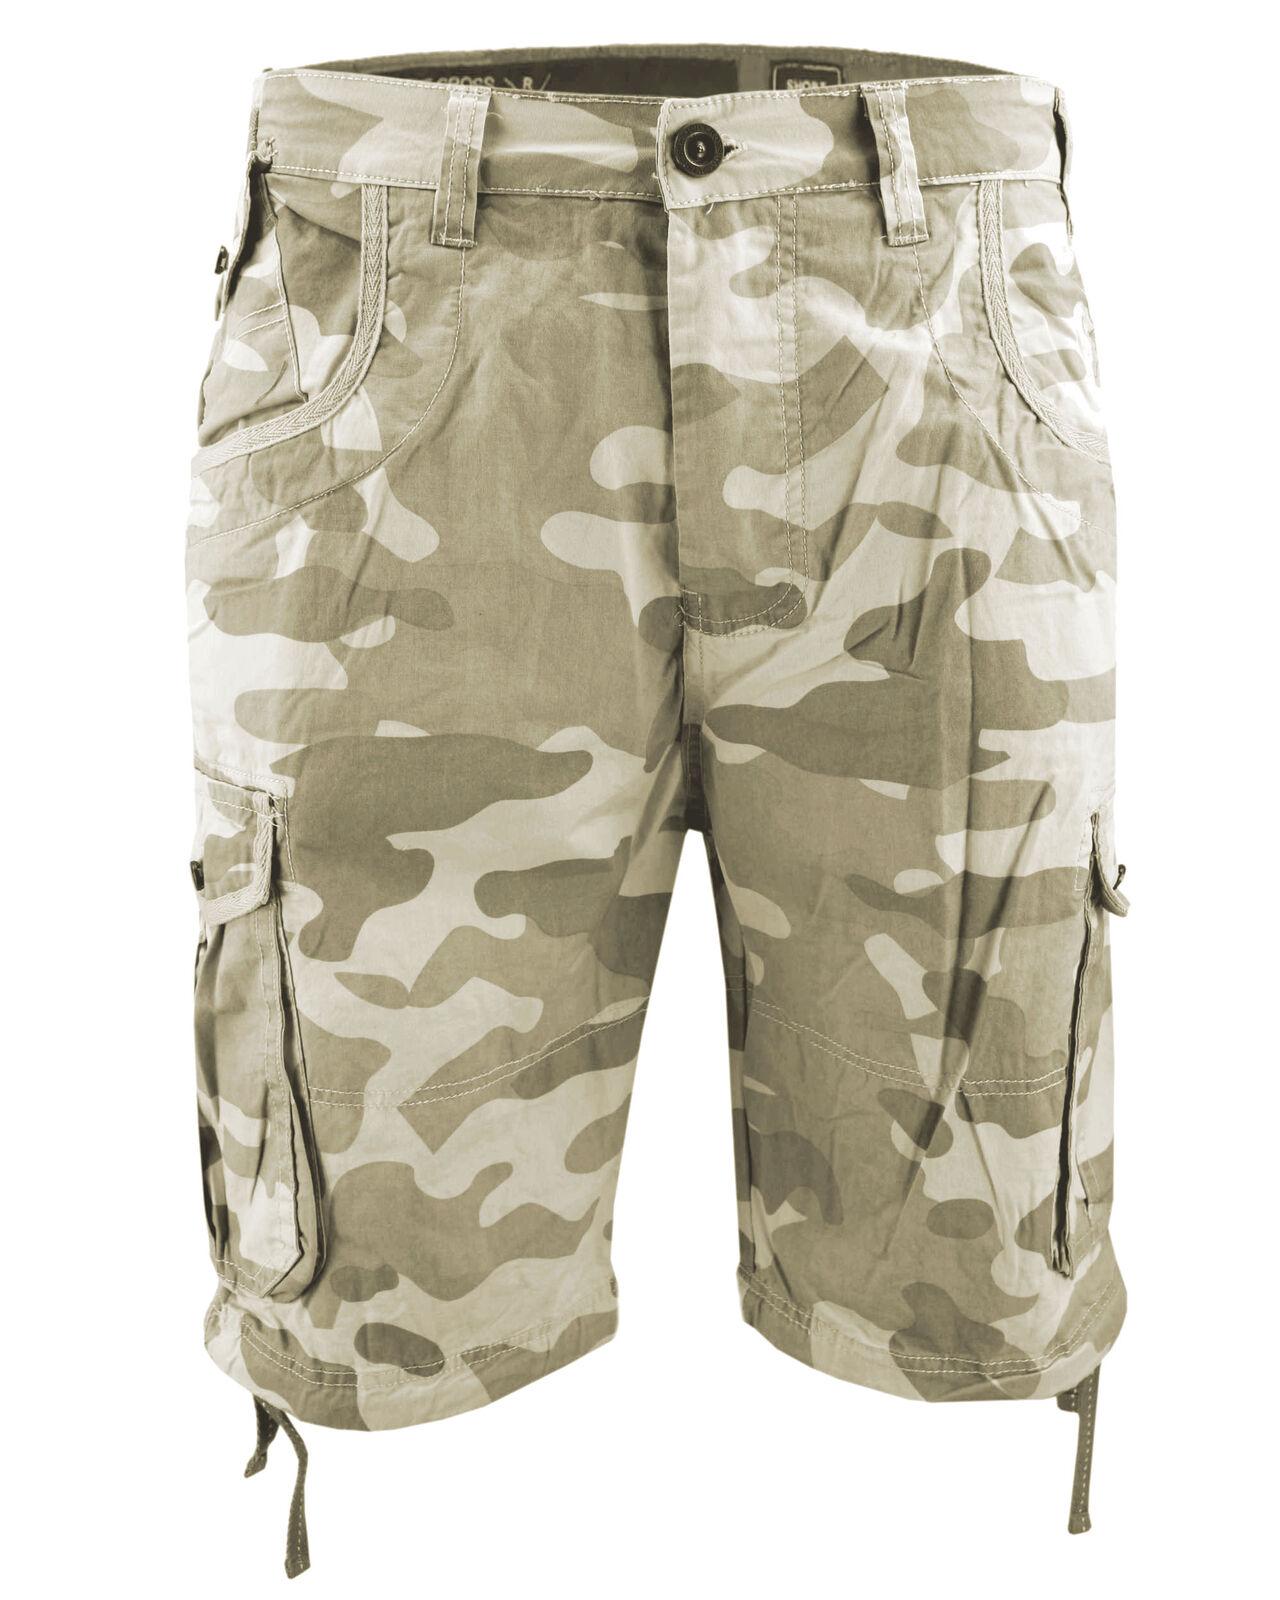 Crosshatch da uomo pantaloncini ryehill MIMETICI COMBATTIMENTO COMBATTIMENTO COMBATTIMENTO Pantaloni corti 8de9b2